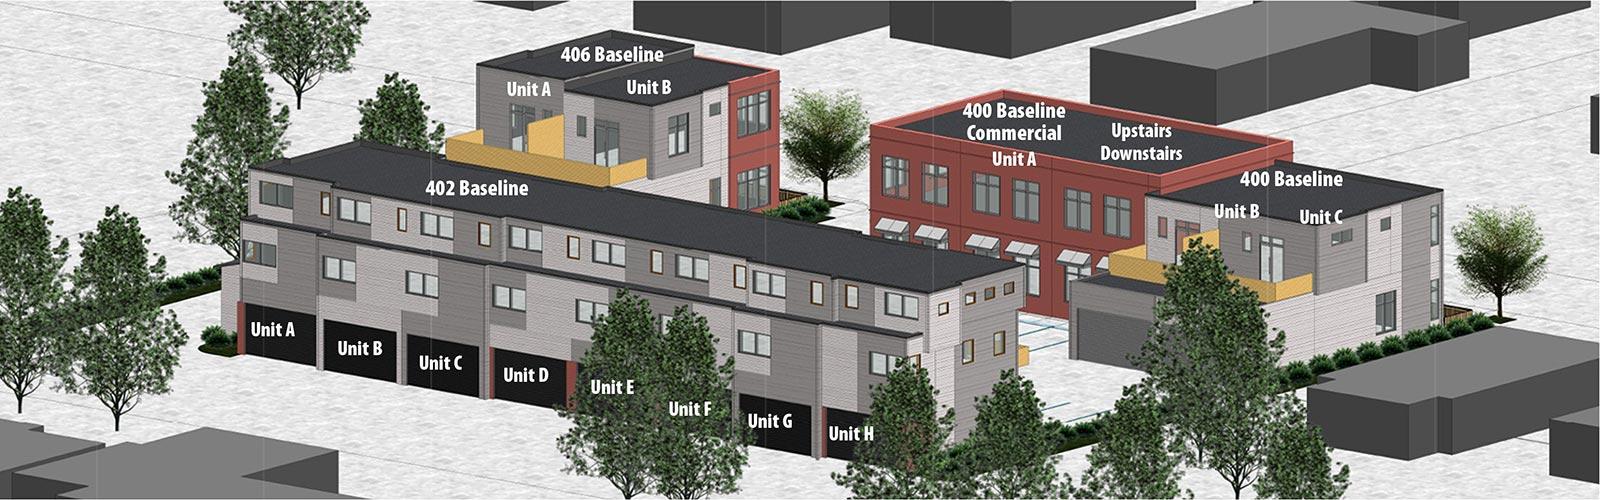 baseline oldtown luxury condominiums lafayette colorado